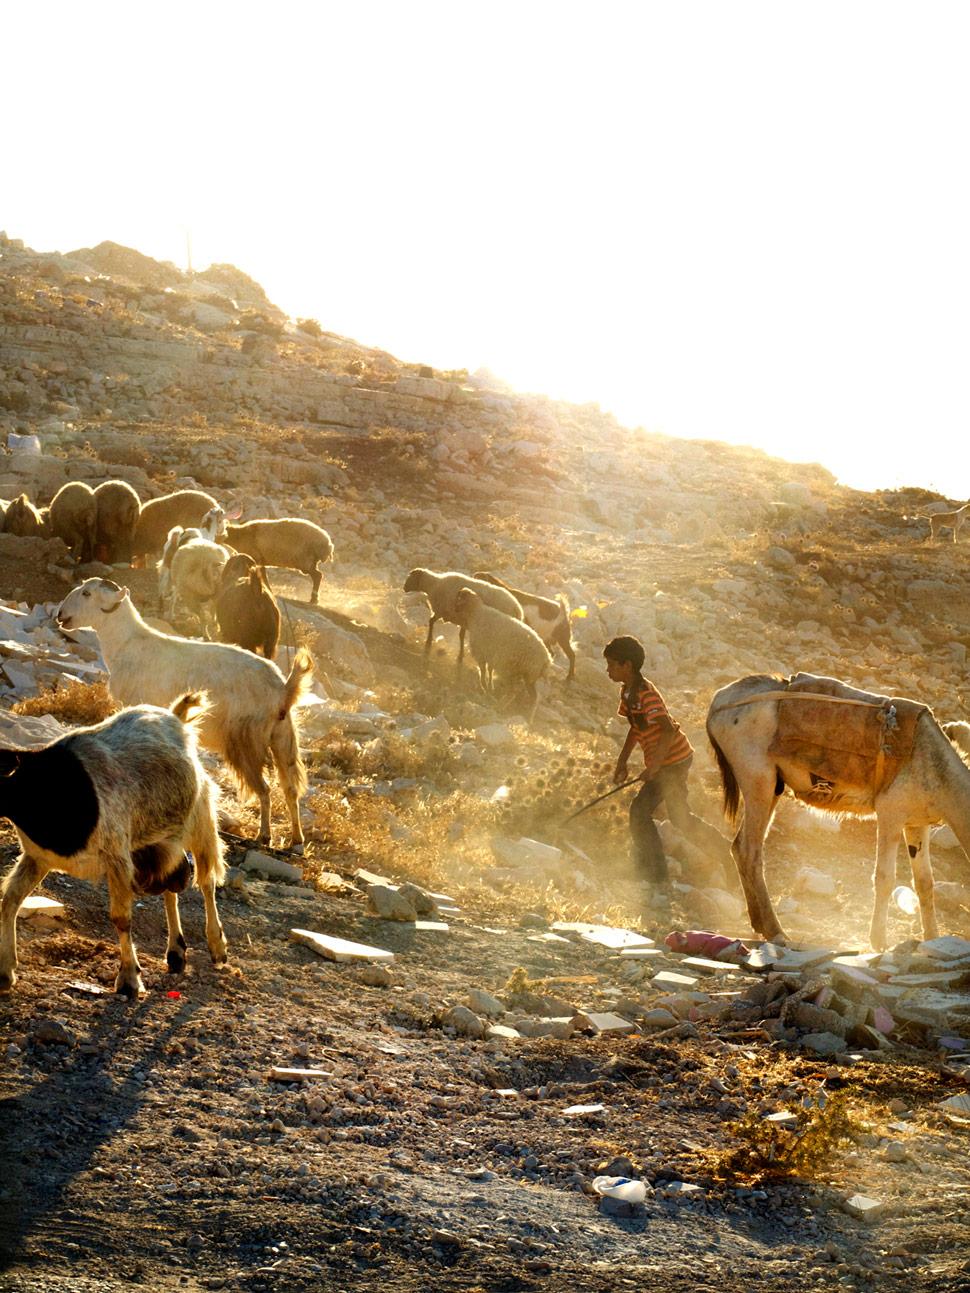 Kamal Wyatt - Bediwin boy and his goats